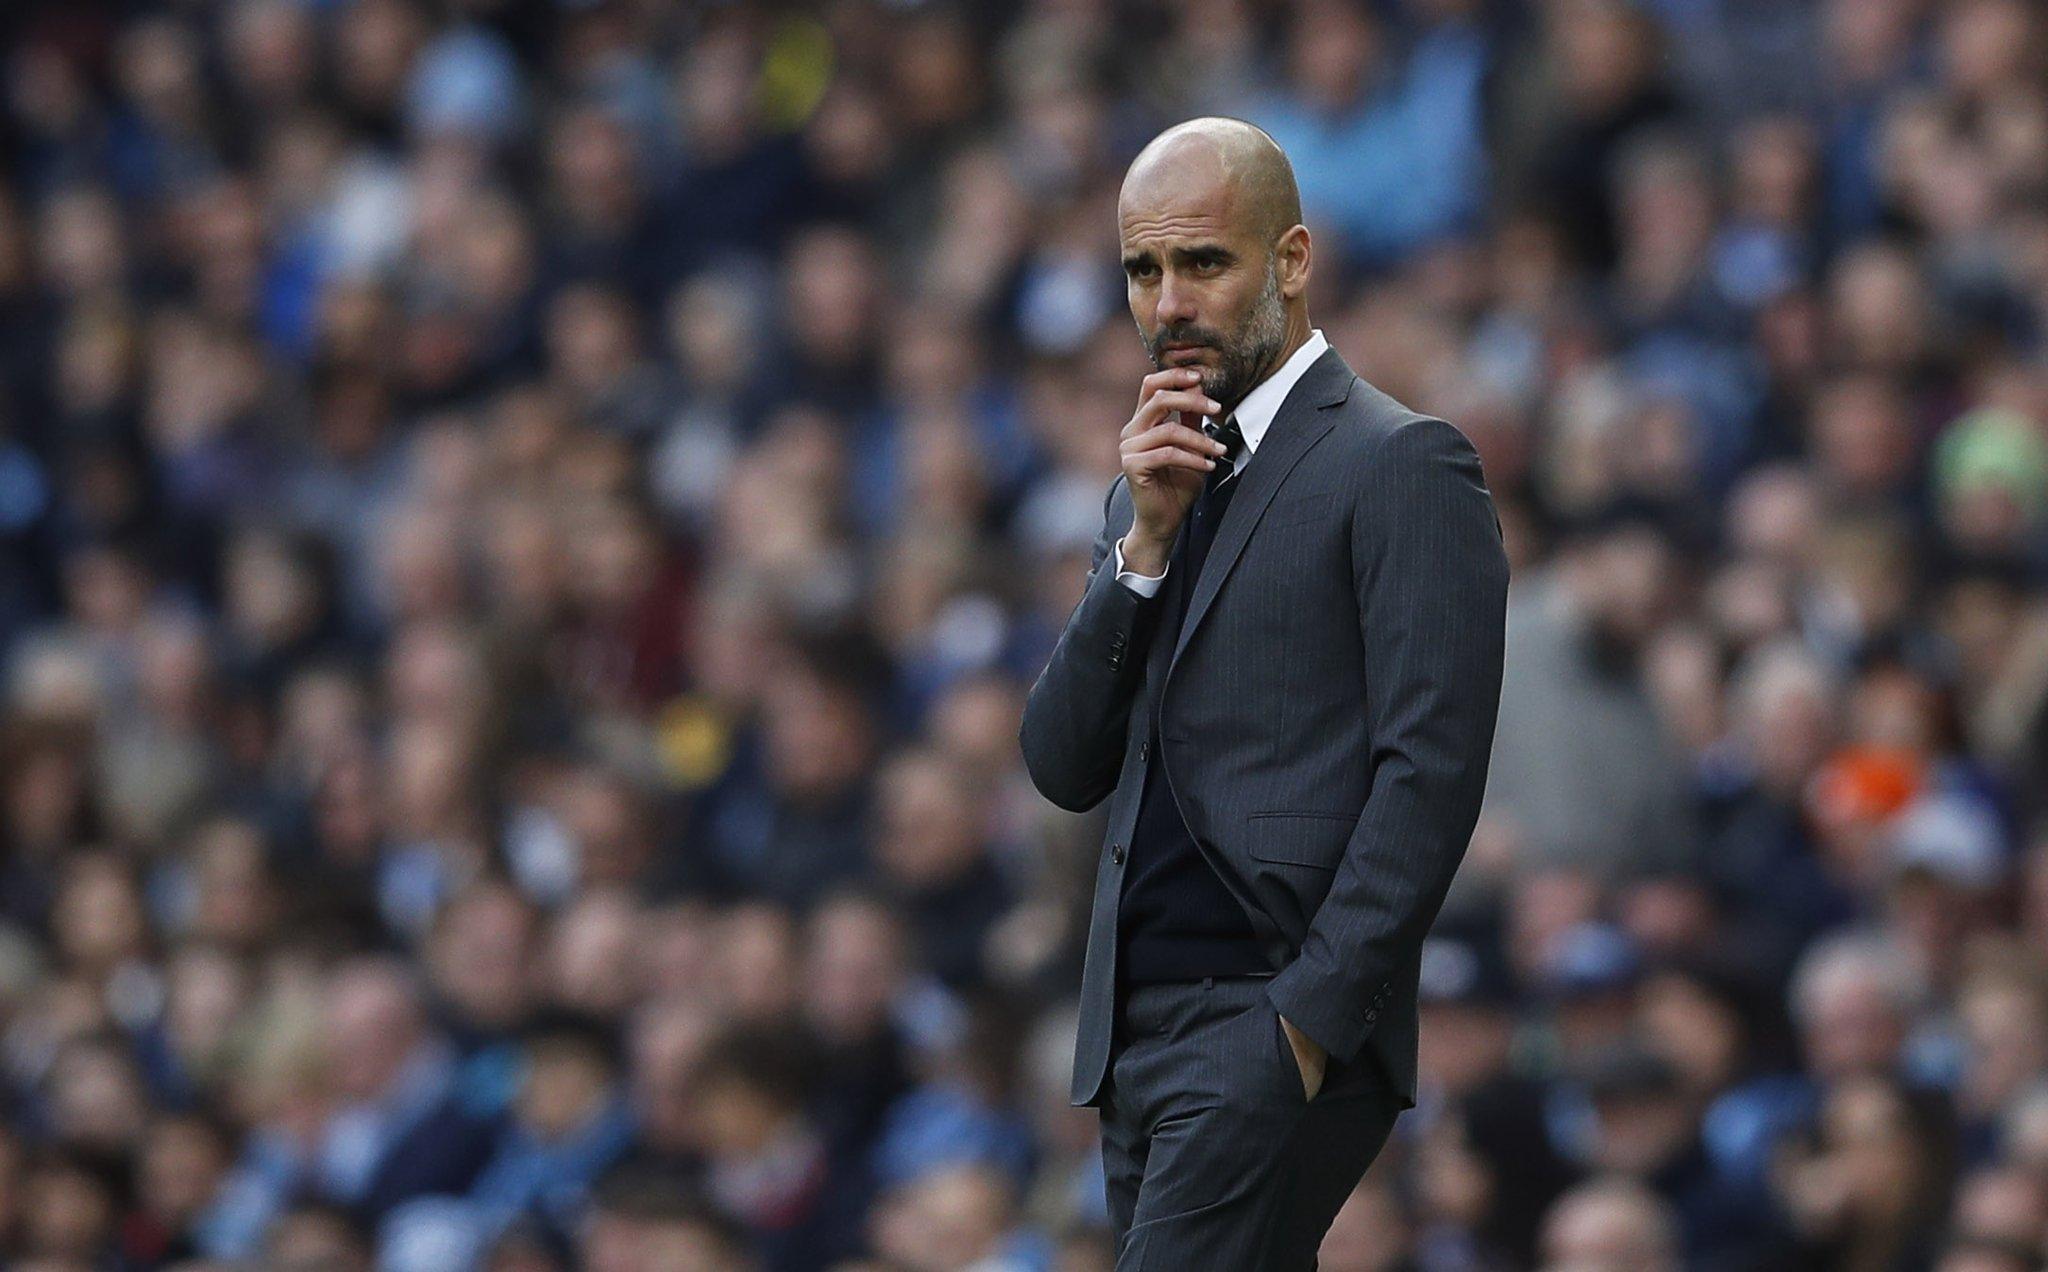 Guardiola, Zidane, Klopp, Ranieri Up For FIFA Best Coach Award